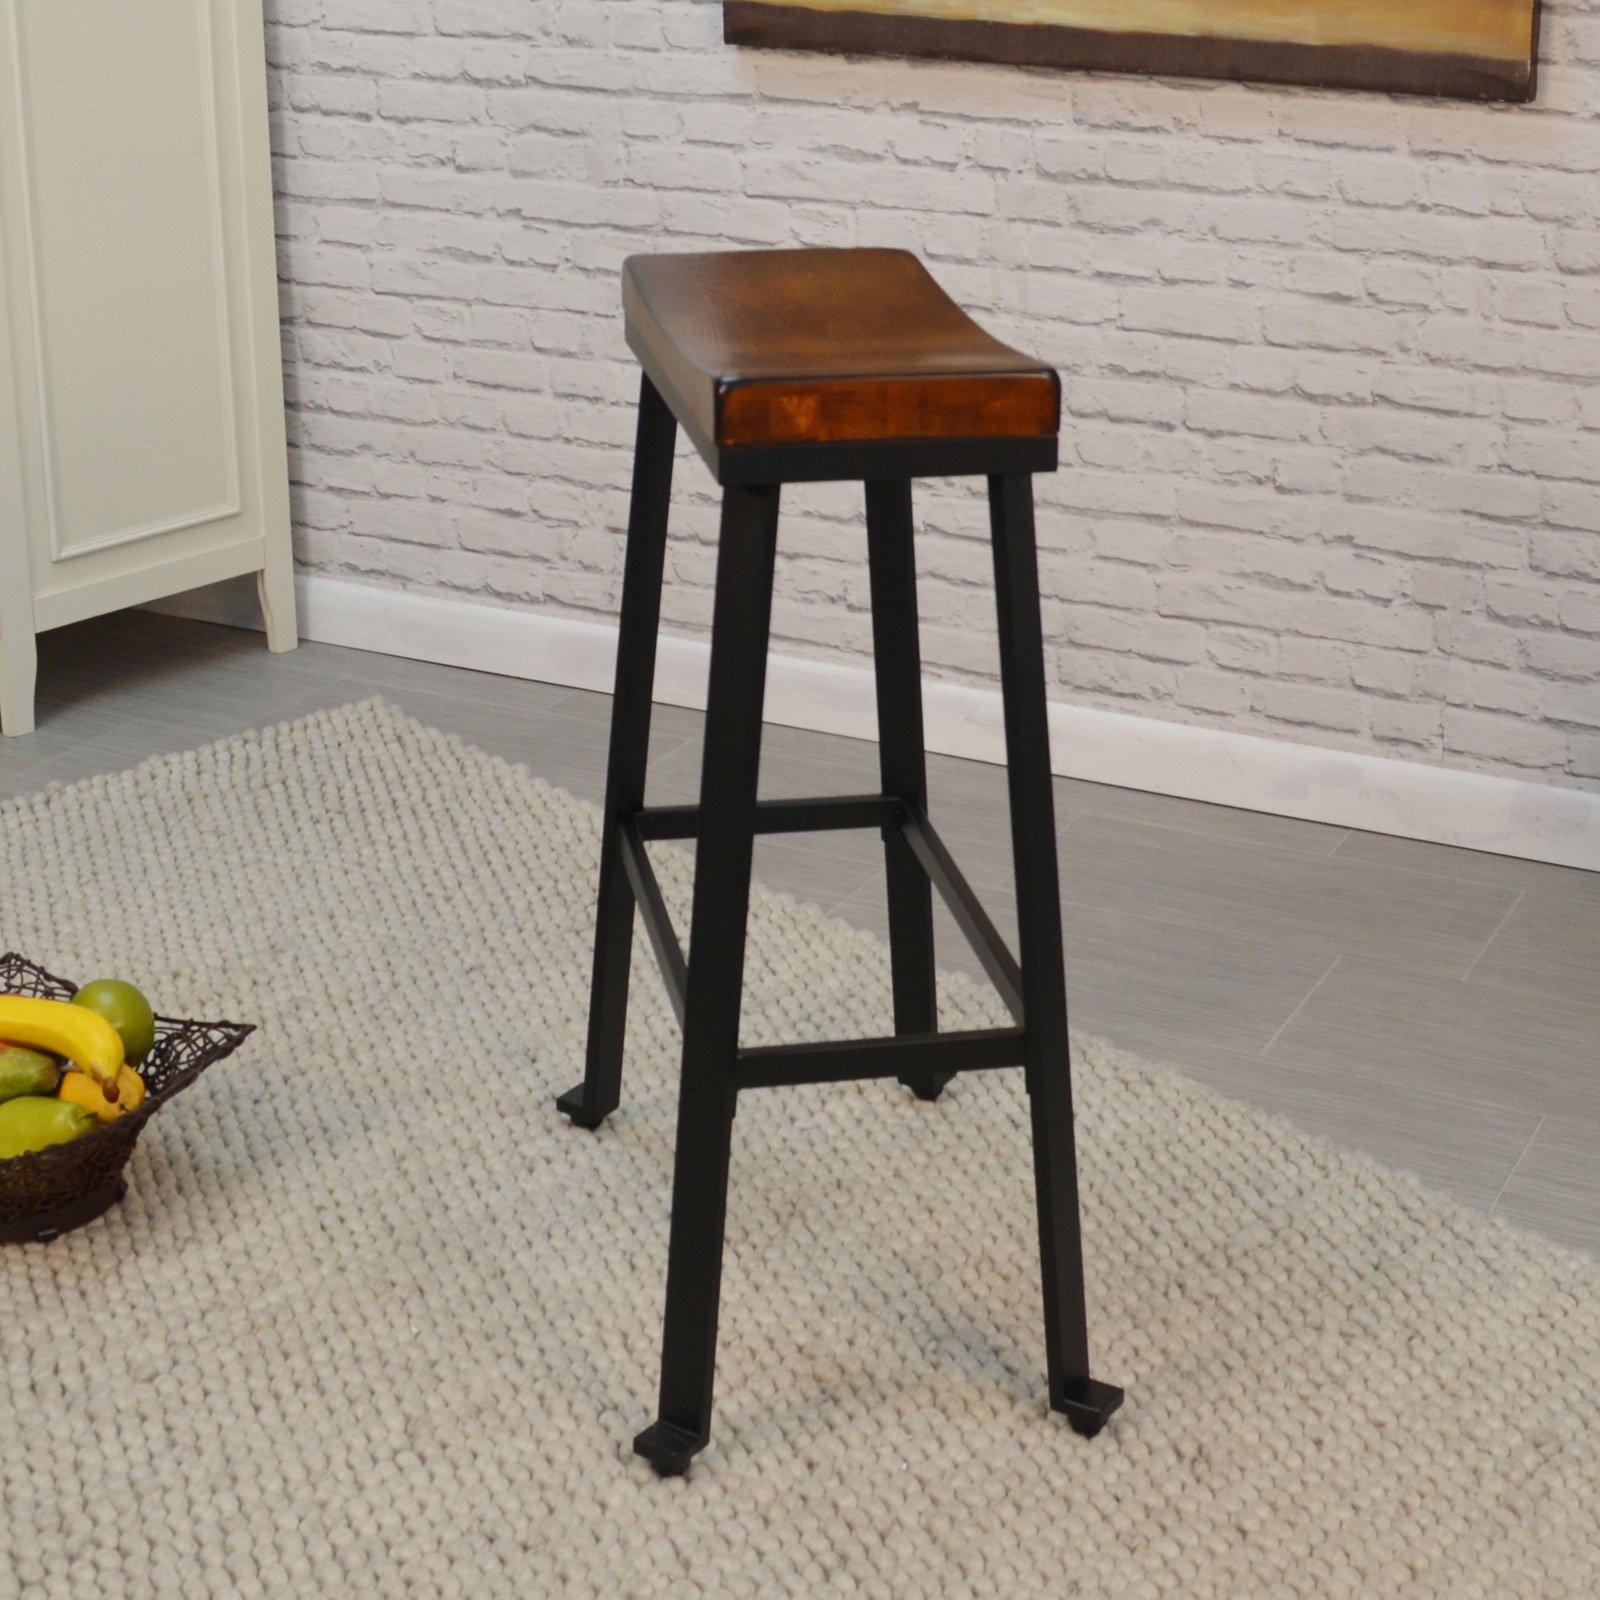 Carolina Chair And Table Oda 30 In Saddle Seat Backless Bar Stool